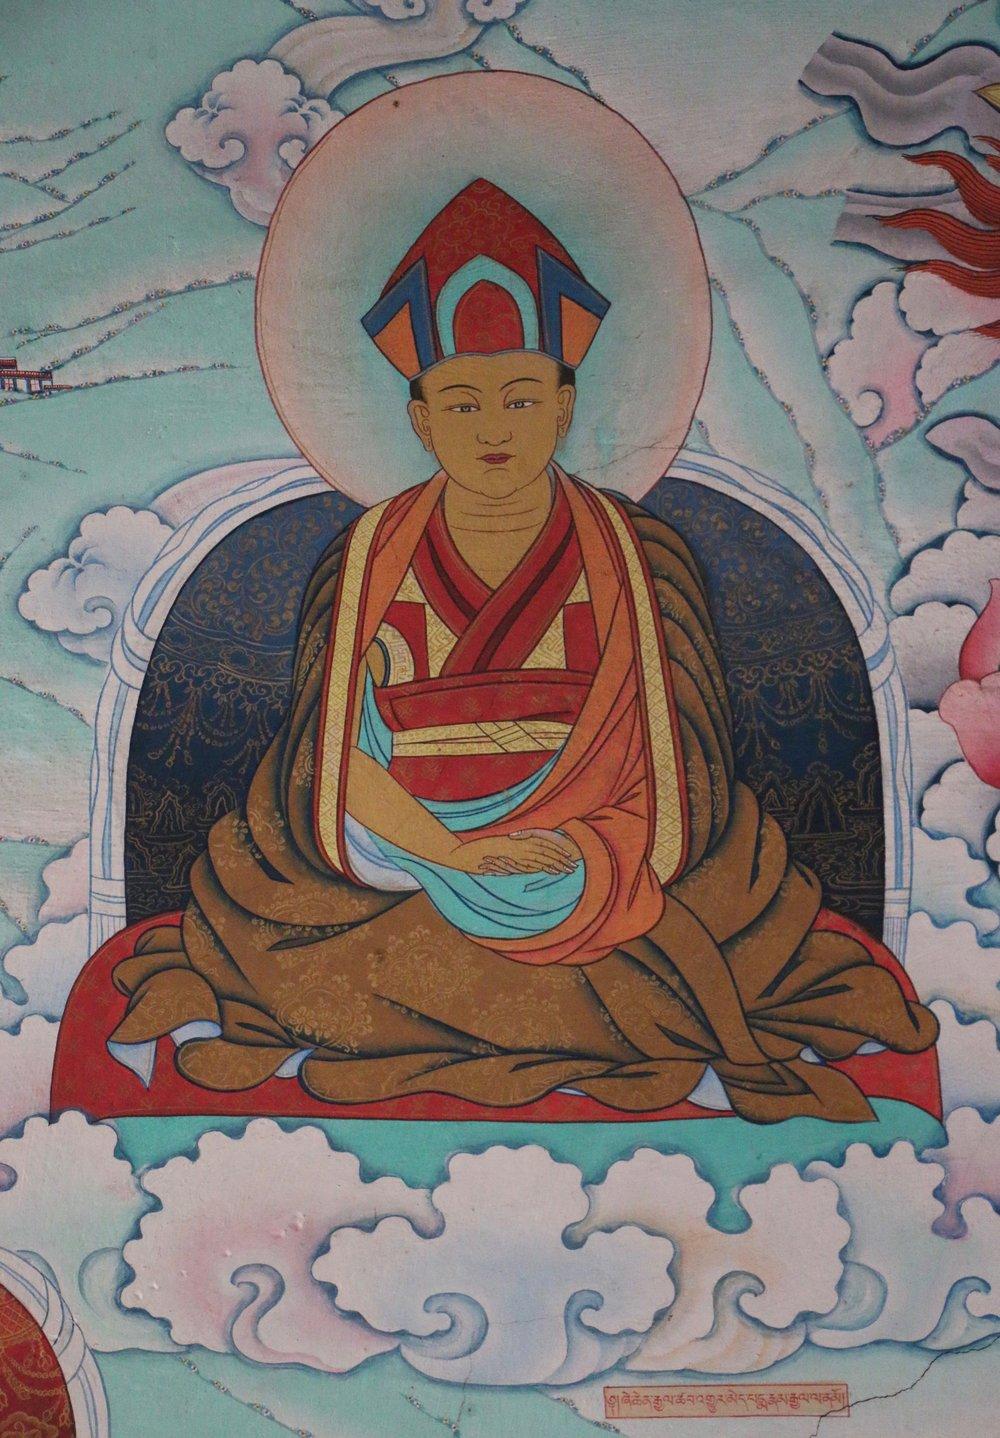 Shechen Gyaltsab Gyurme Pema Namgyal